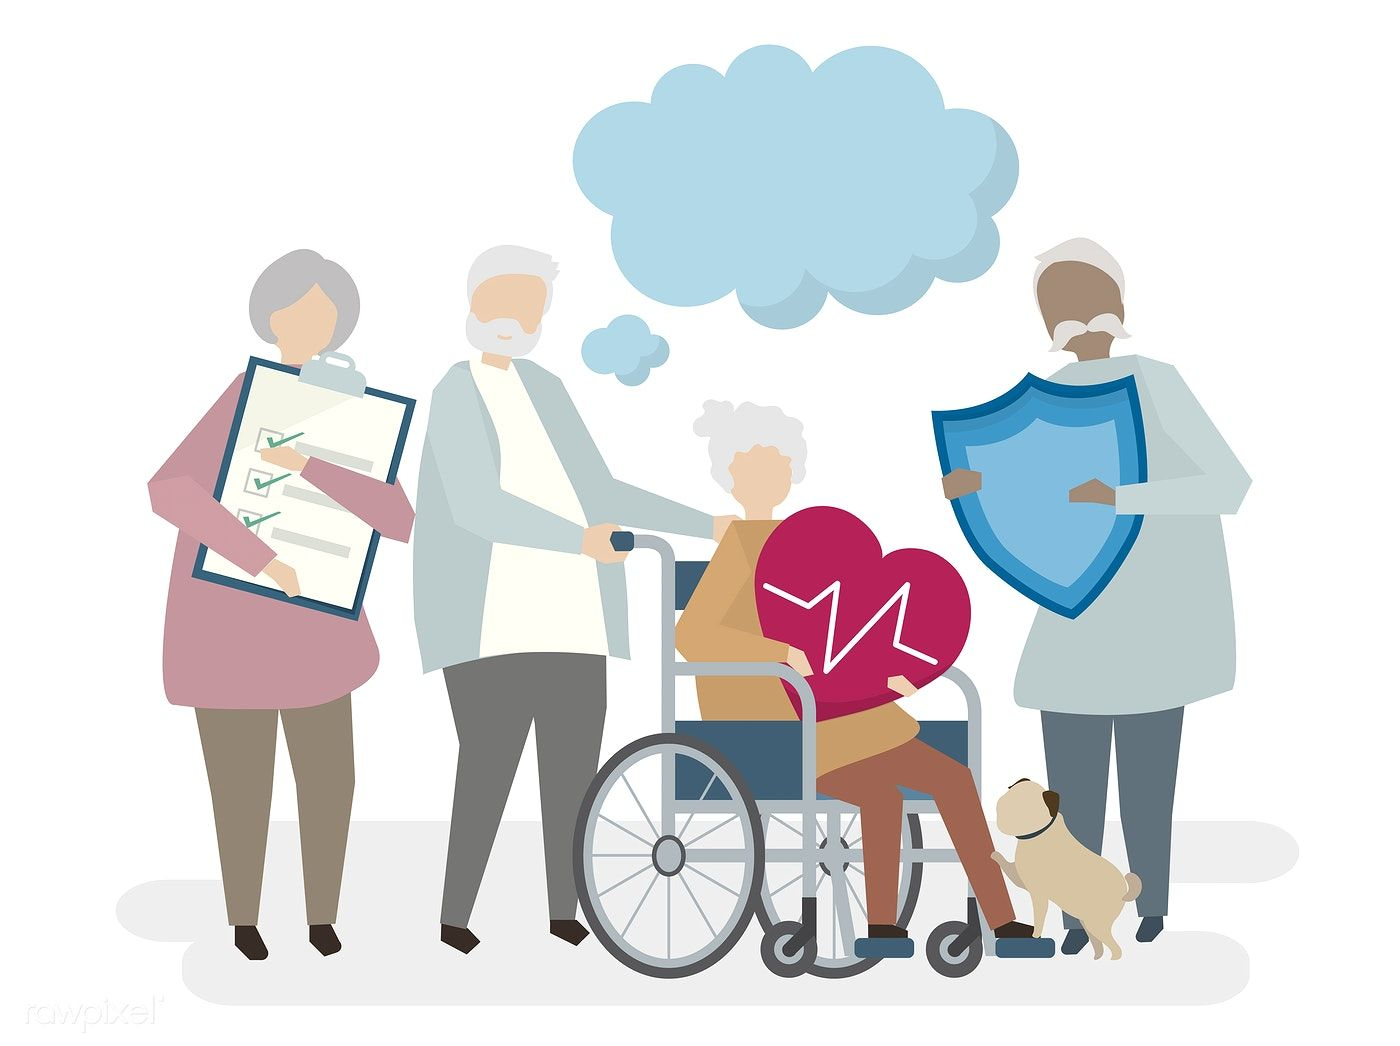 Download premium illustration of illustration of seniors